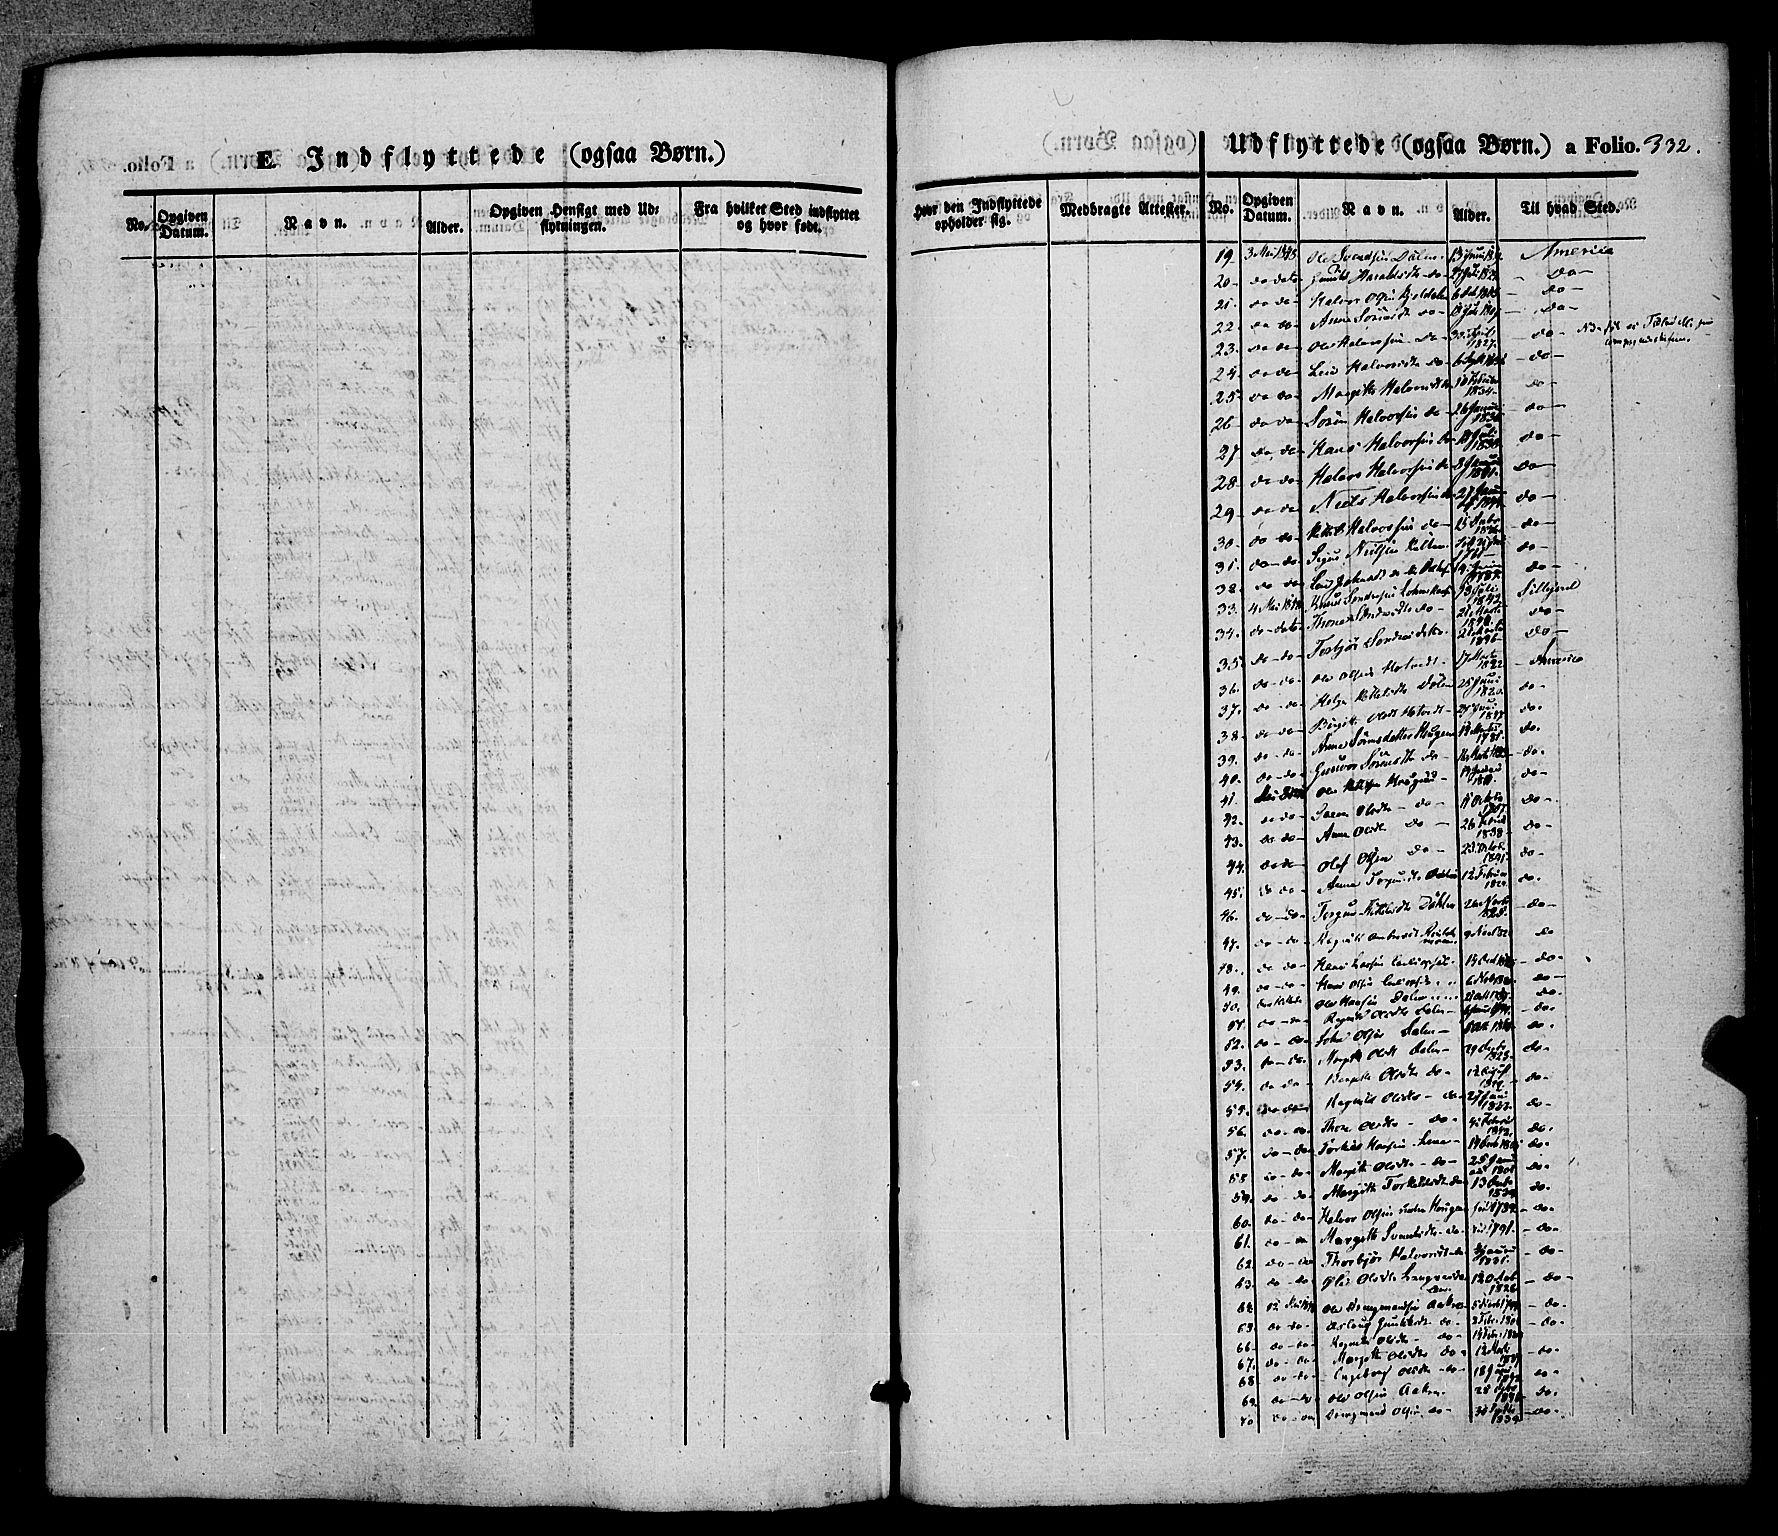 SAKO, Hjartdal kirkebøker, F/Fa/L0008: Ministerialbok nr. I 8, 1844-1859, s. 332